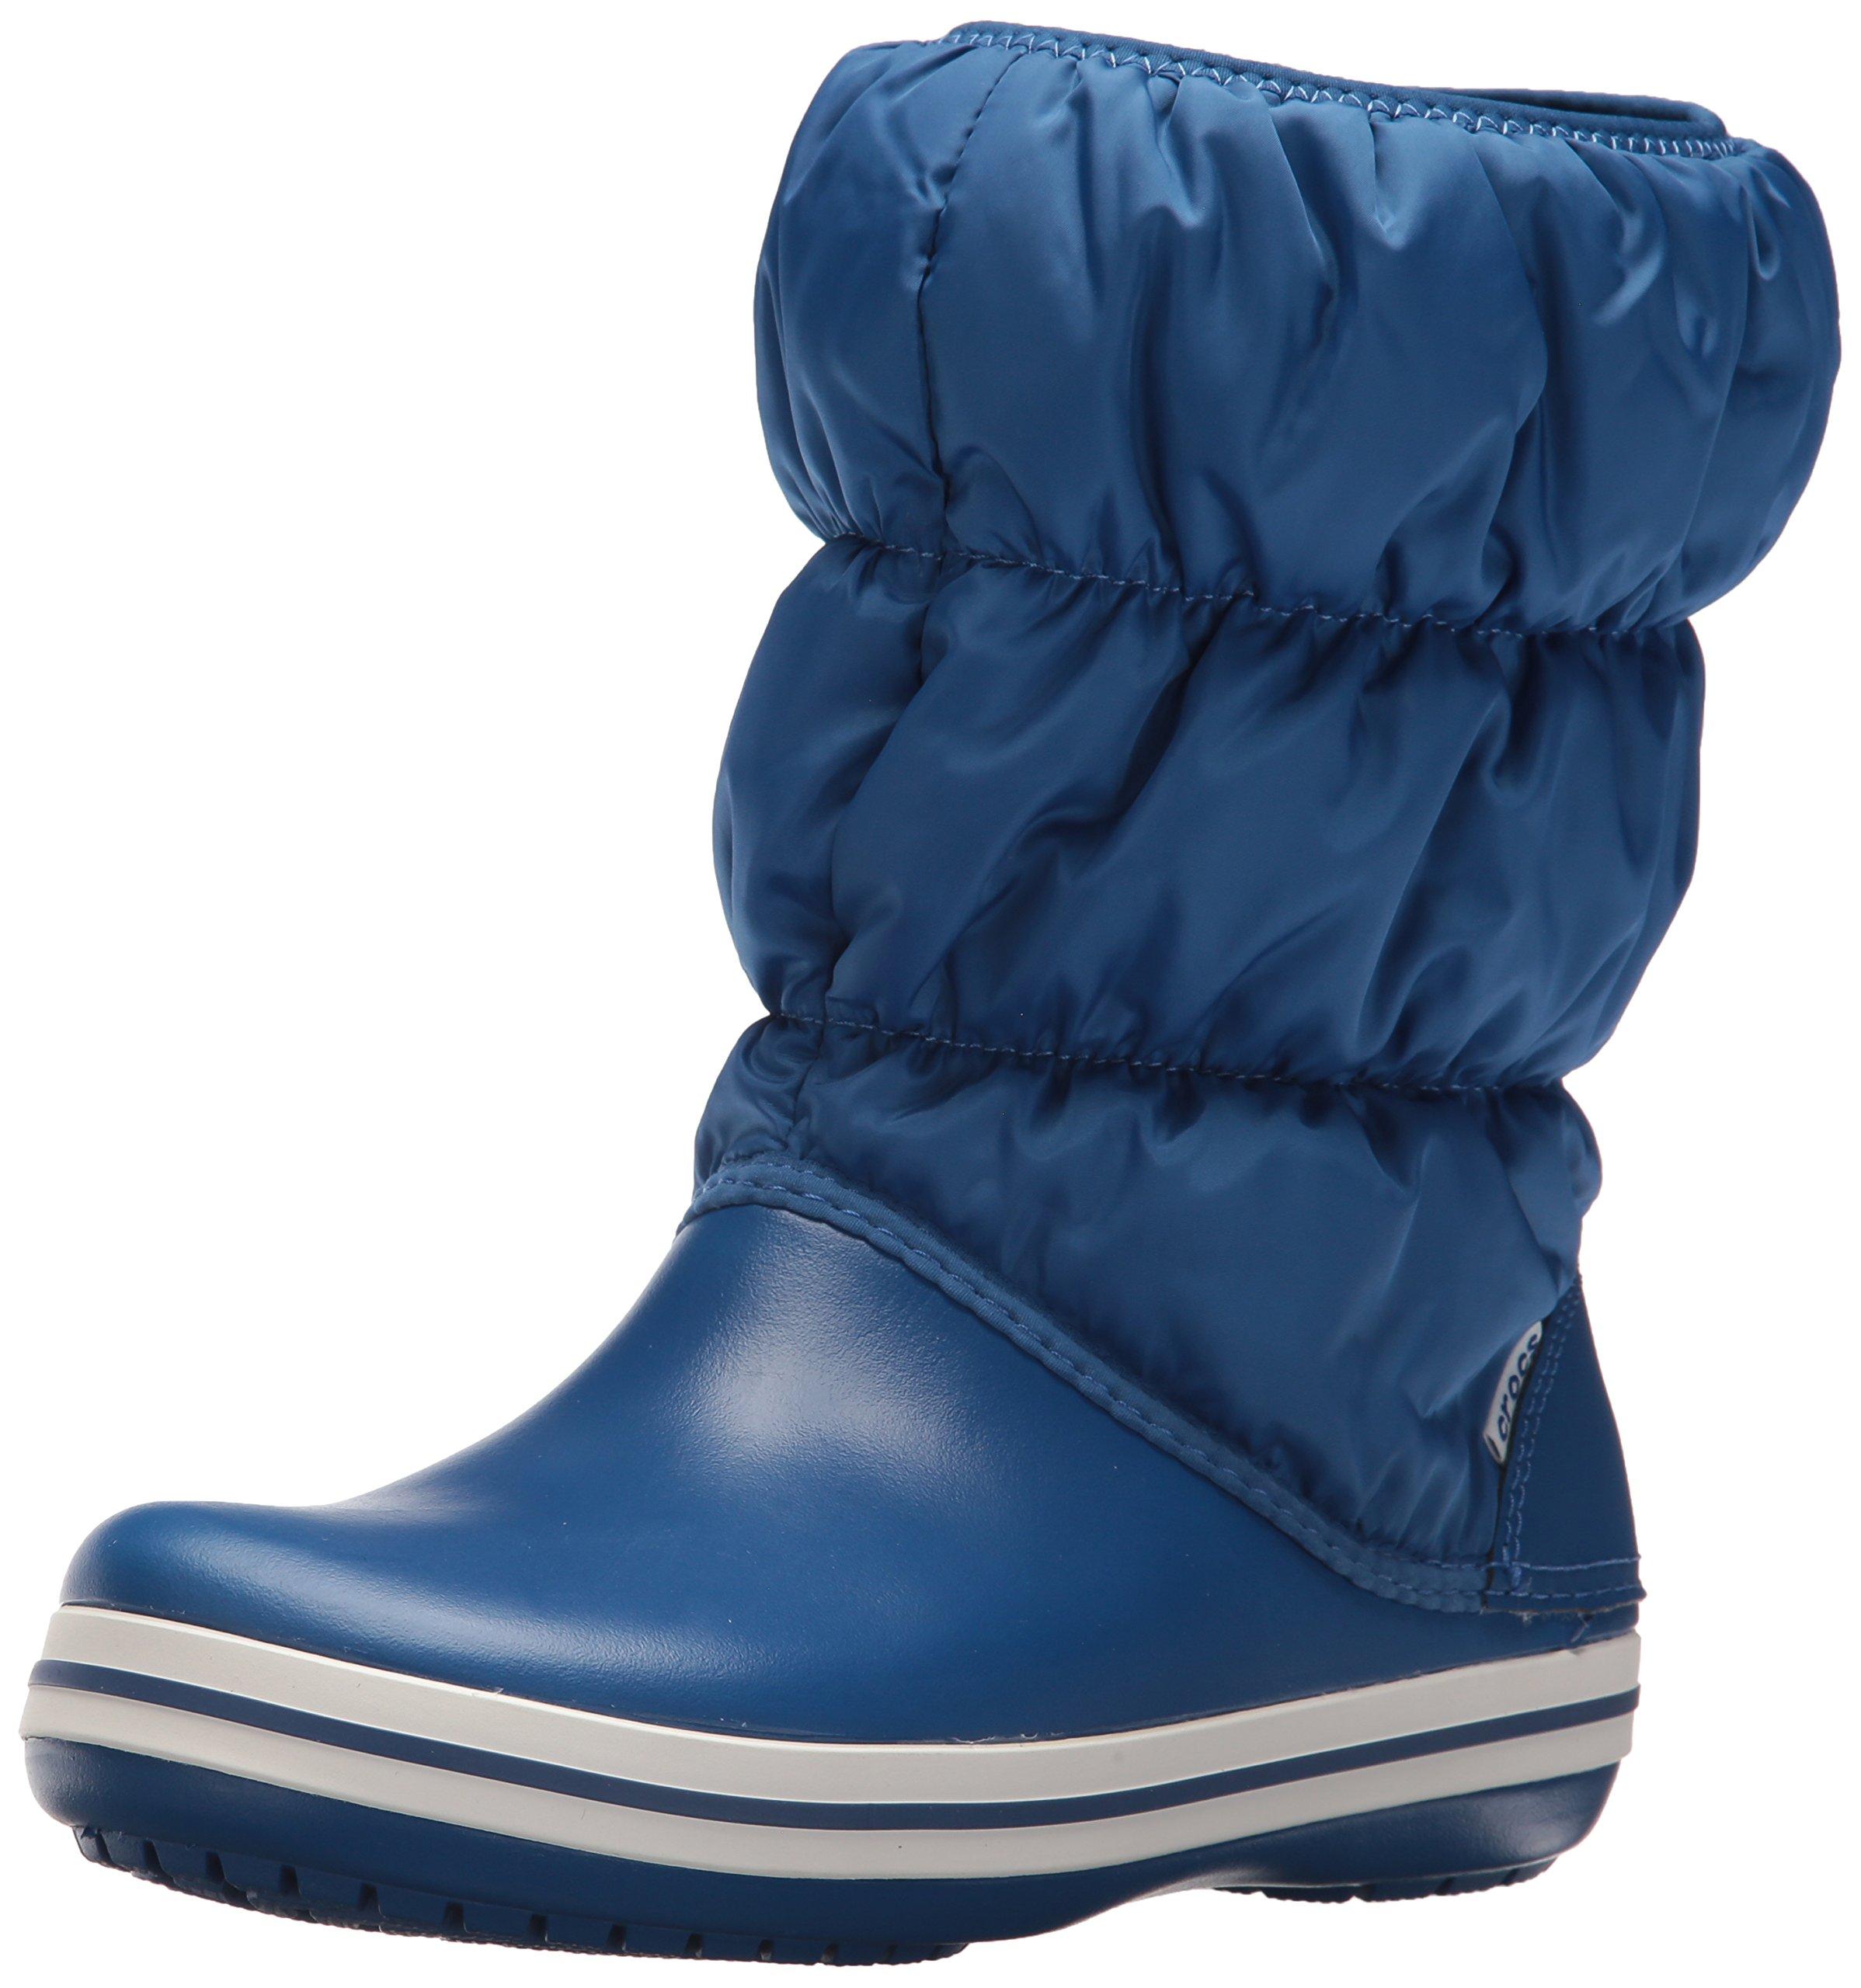 Crocs Women's Winter Puff Snow Boot, Blue Jean/Blue Jean, 6 M US